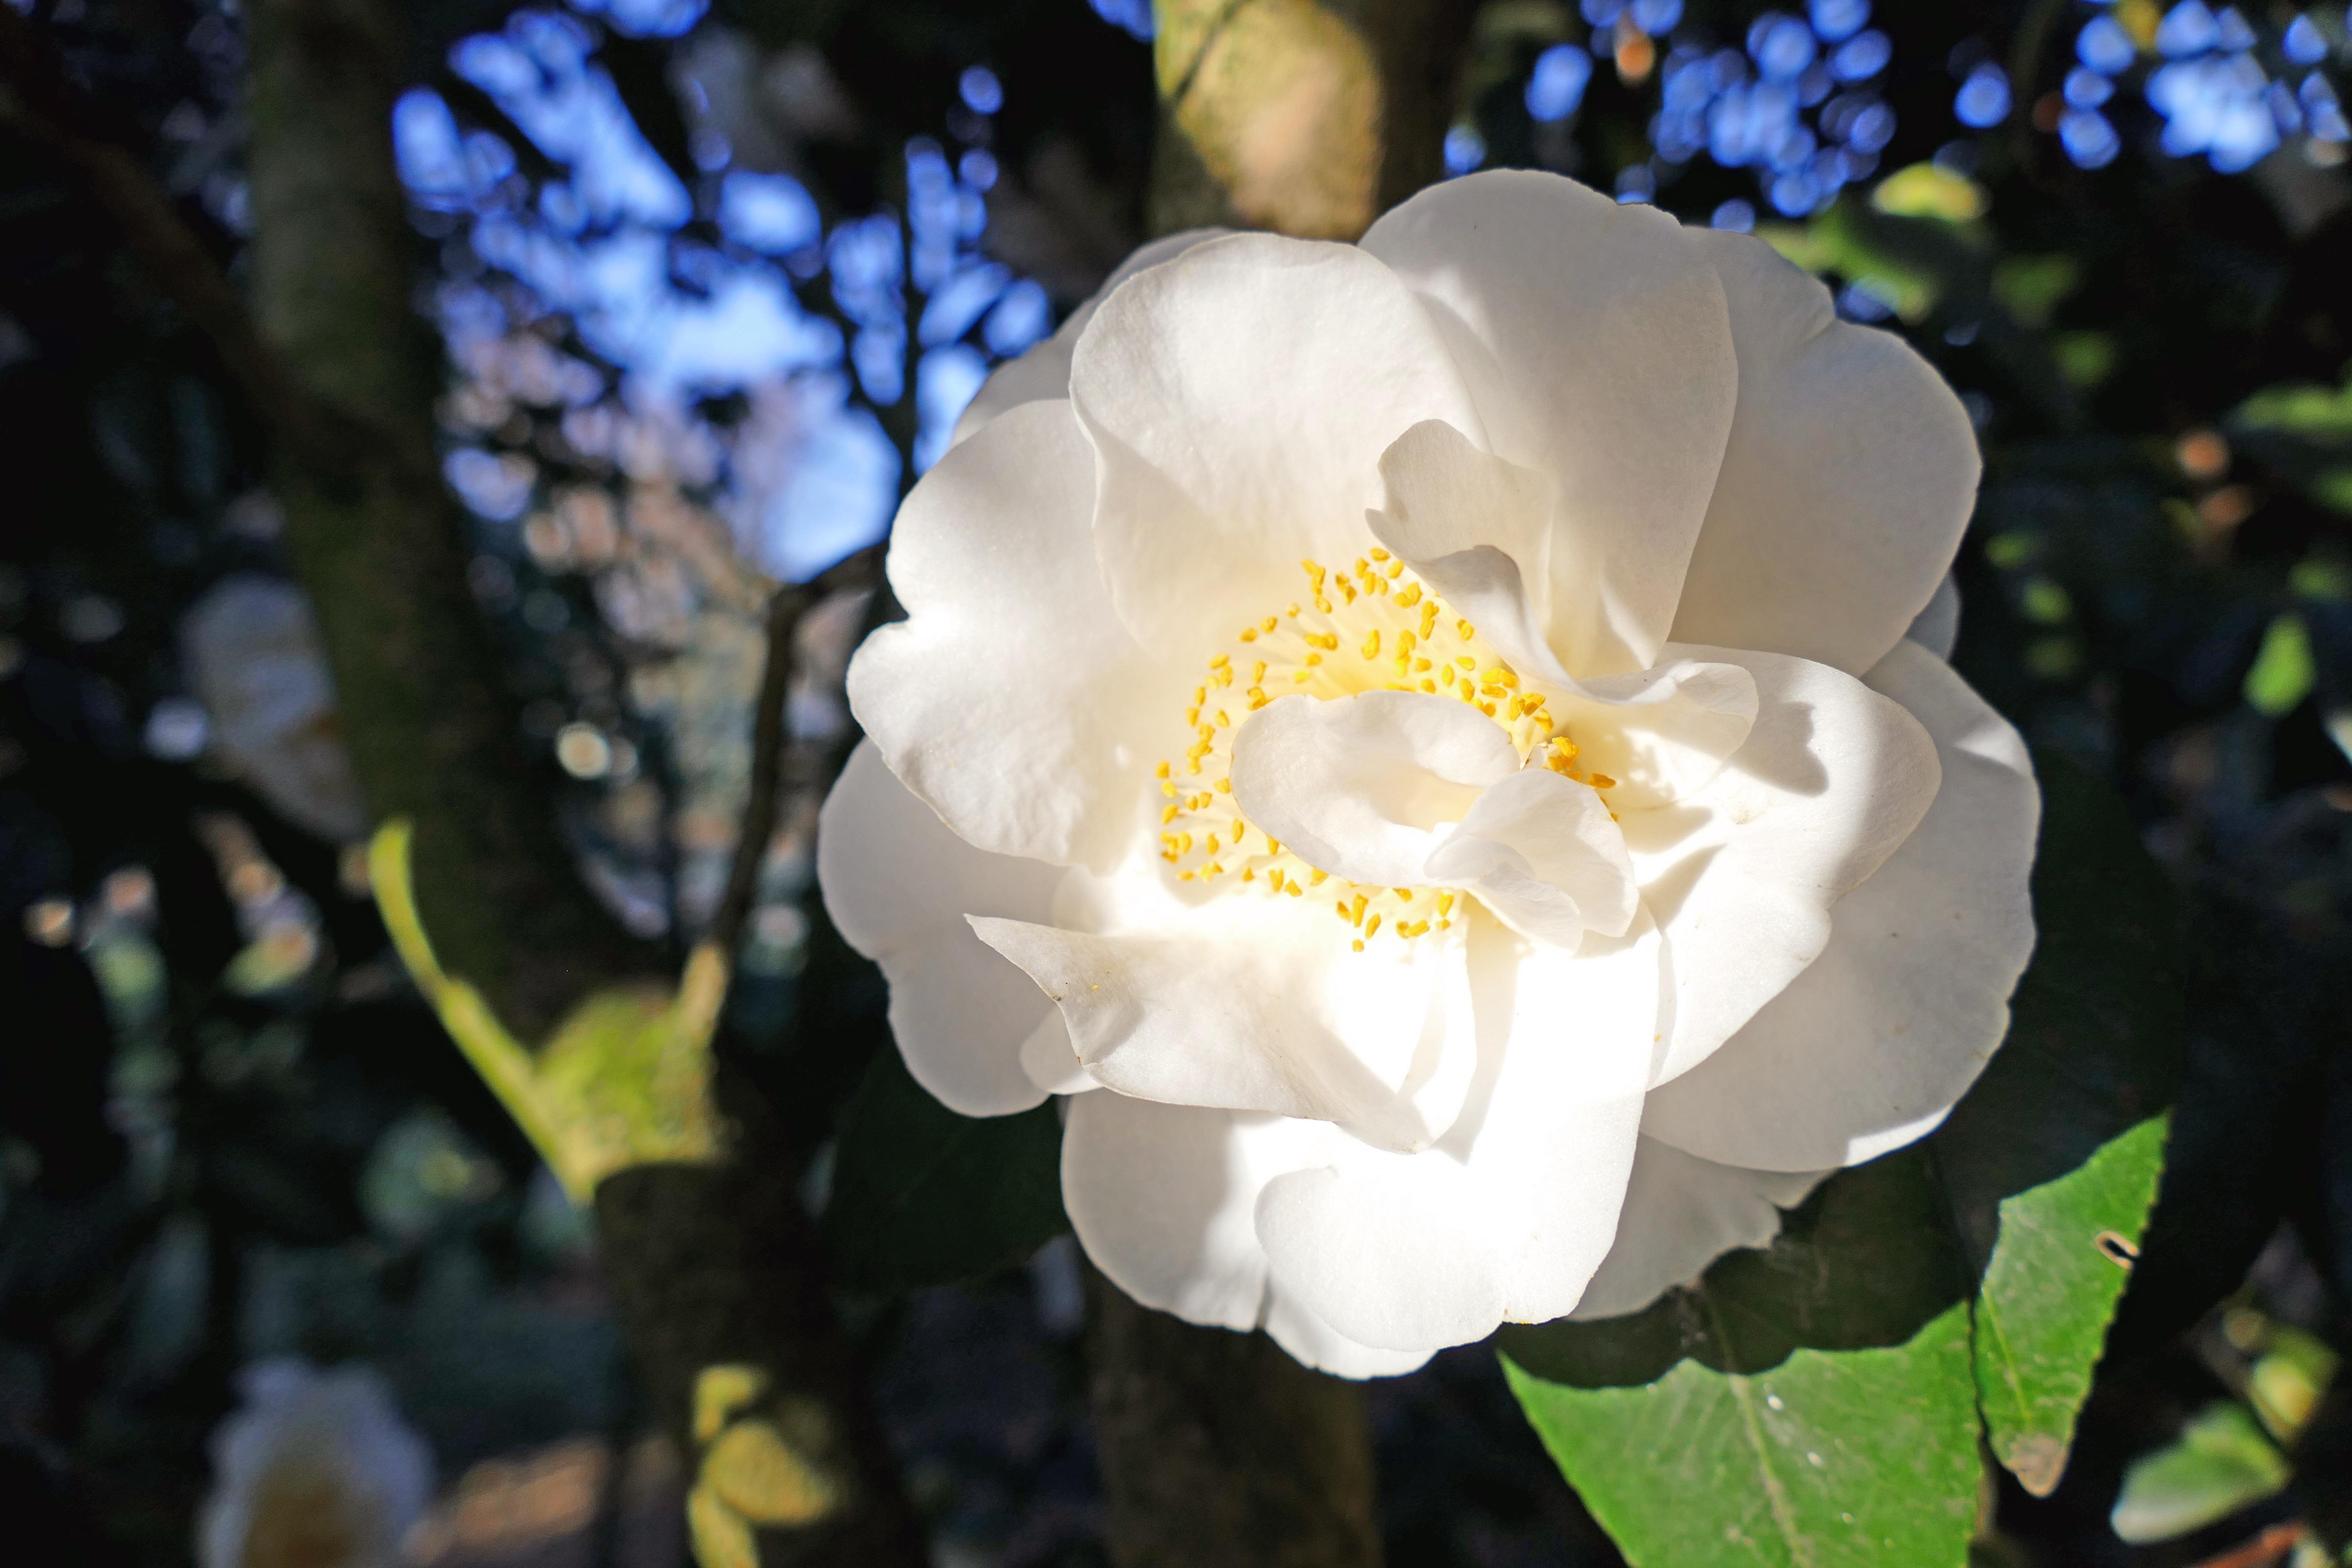 Free Images Nature Blossom Winter White Flower Petal Bloom